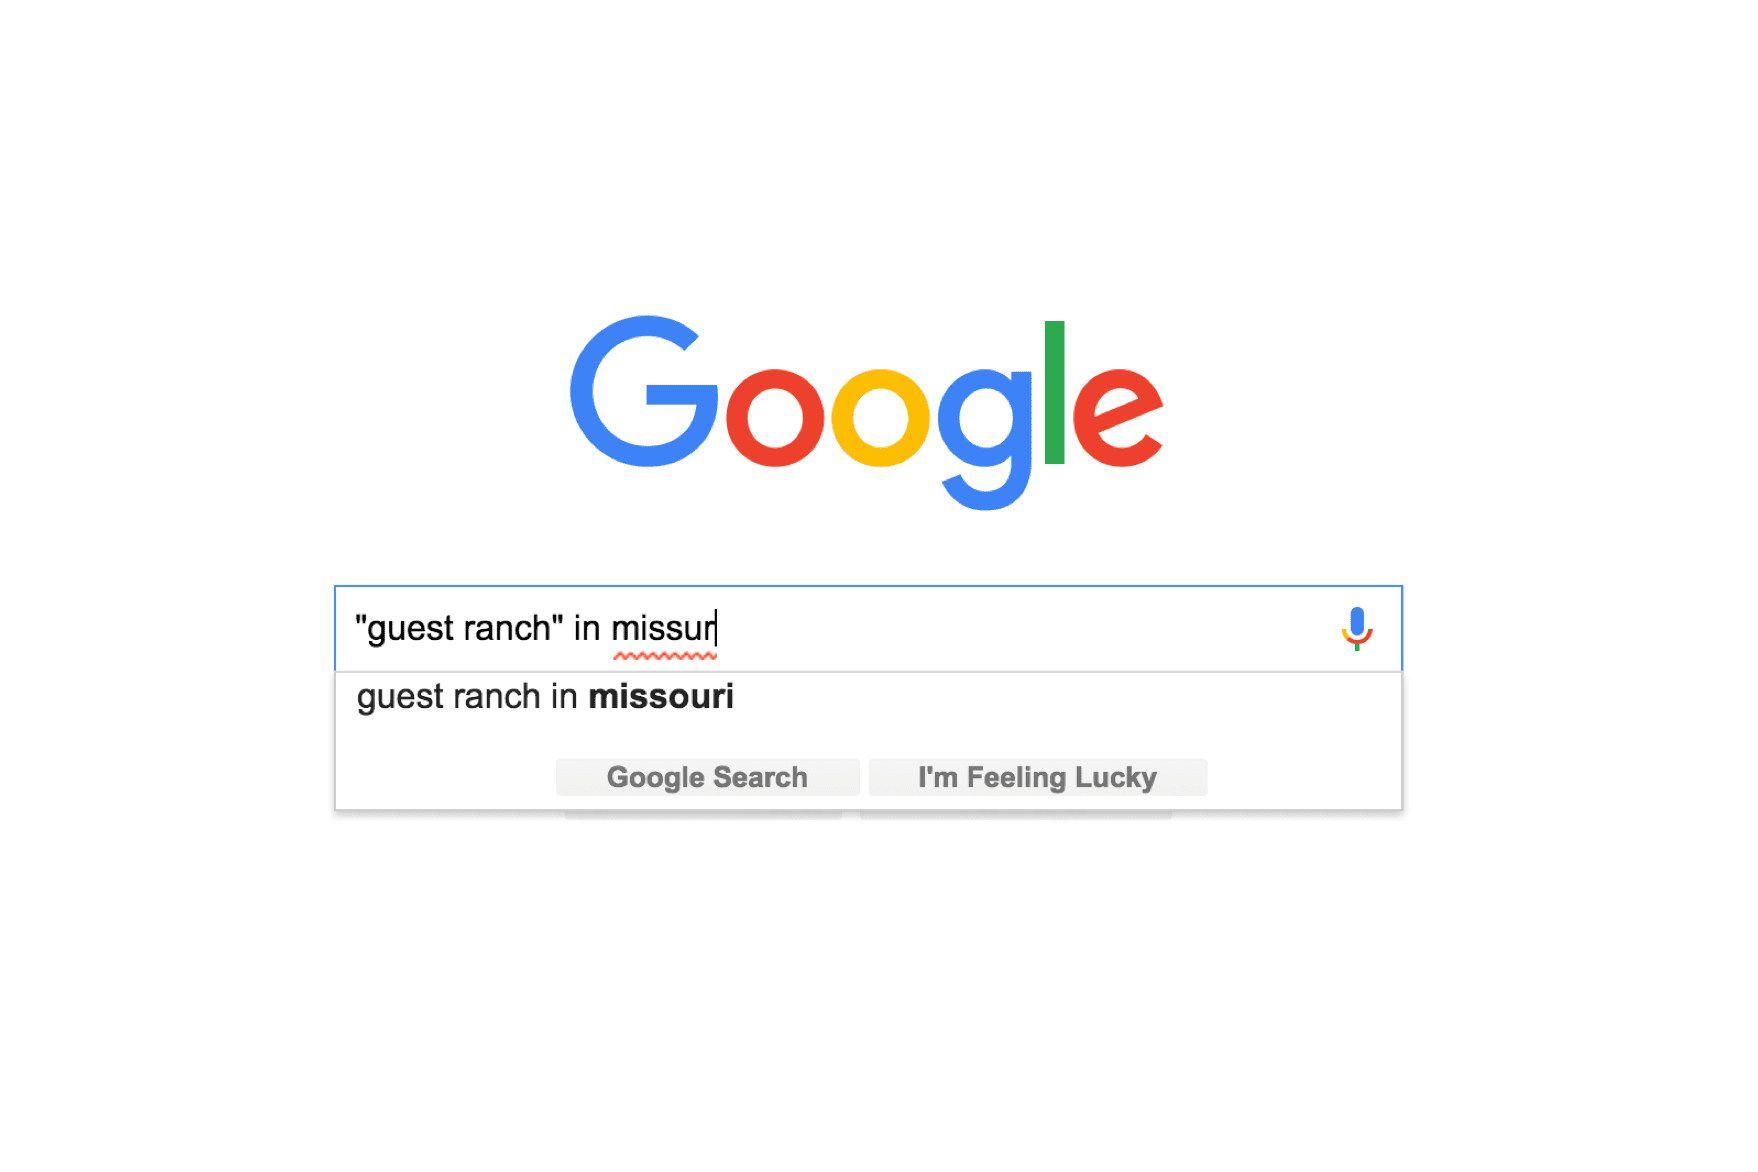 Auto-suggest misspelled word